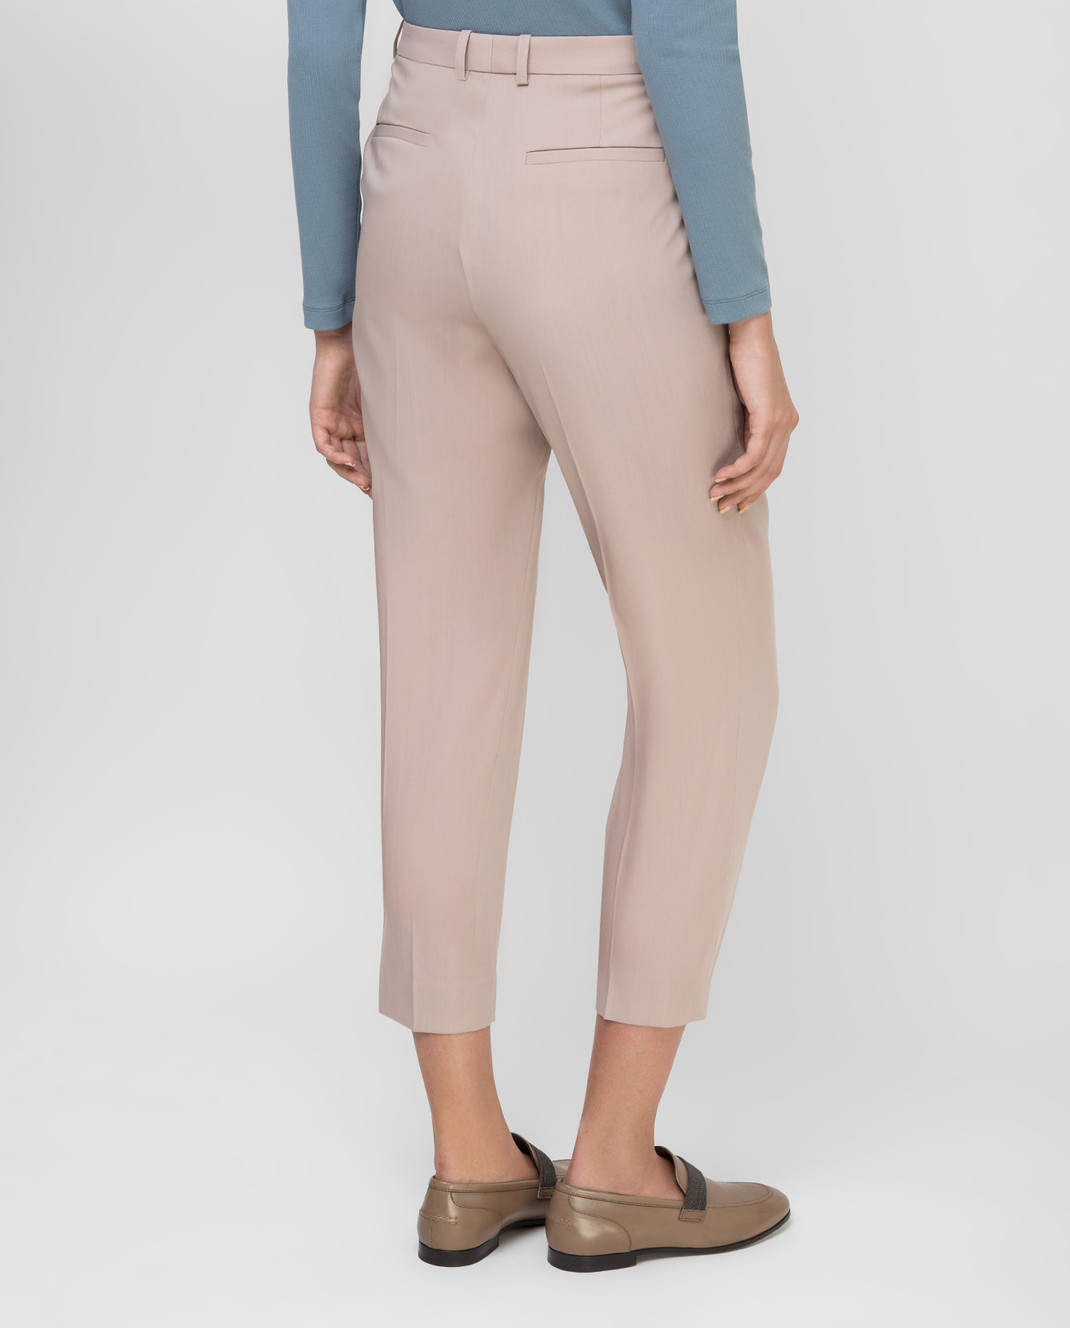 Fabiana Filippi Бежевые брюки из шерсти изображение 4